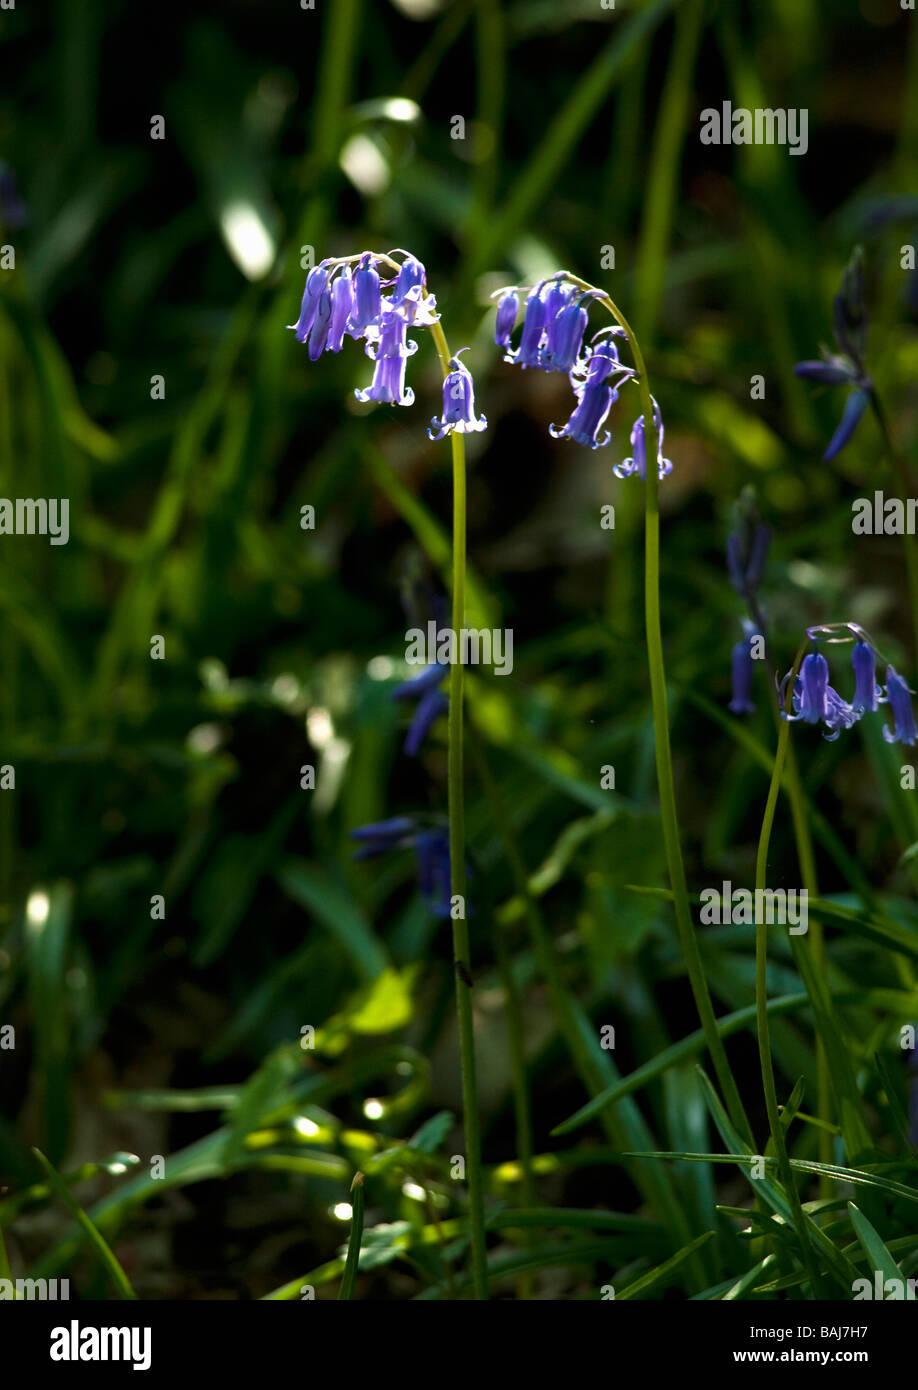 Bluebells bluebell Endymion Scilla Non scriptus Non scripta close up England UK GB British Isles - Stock Image